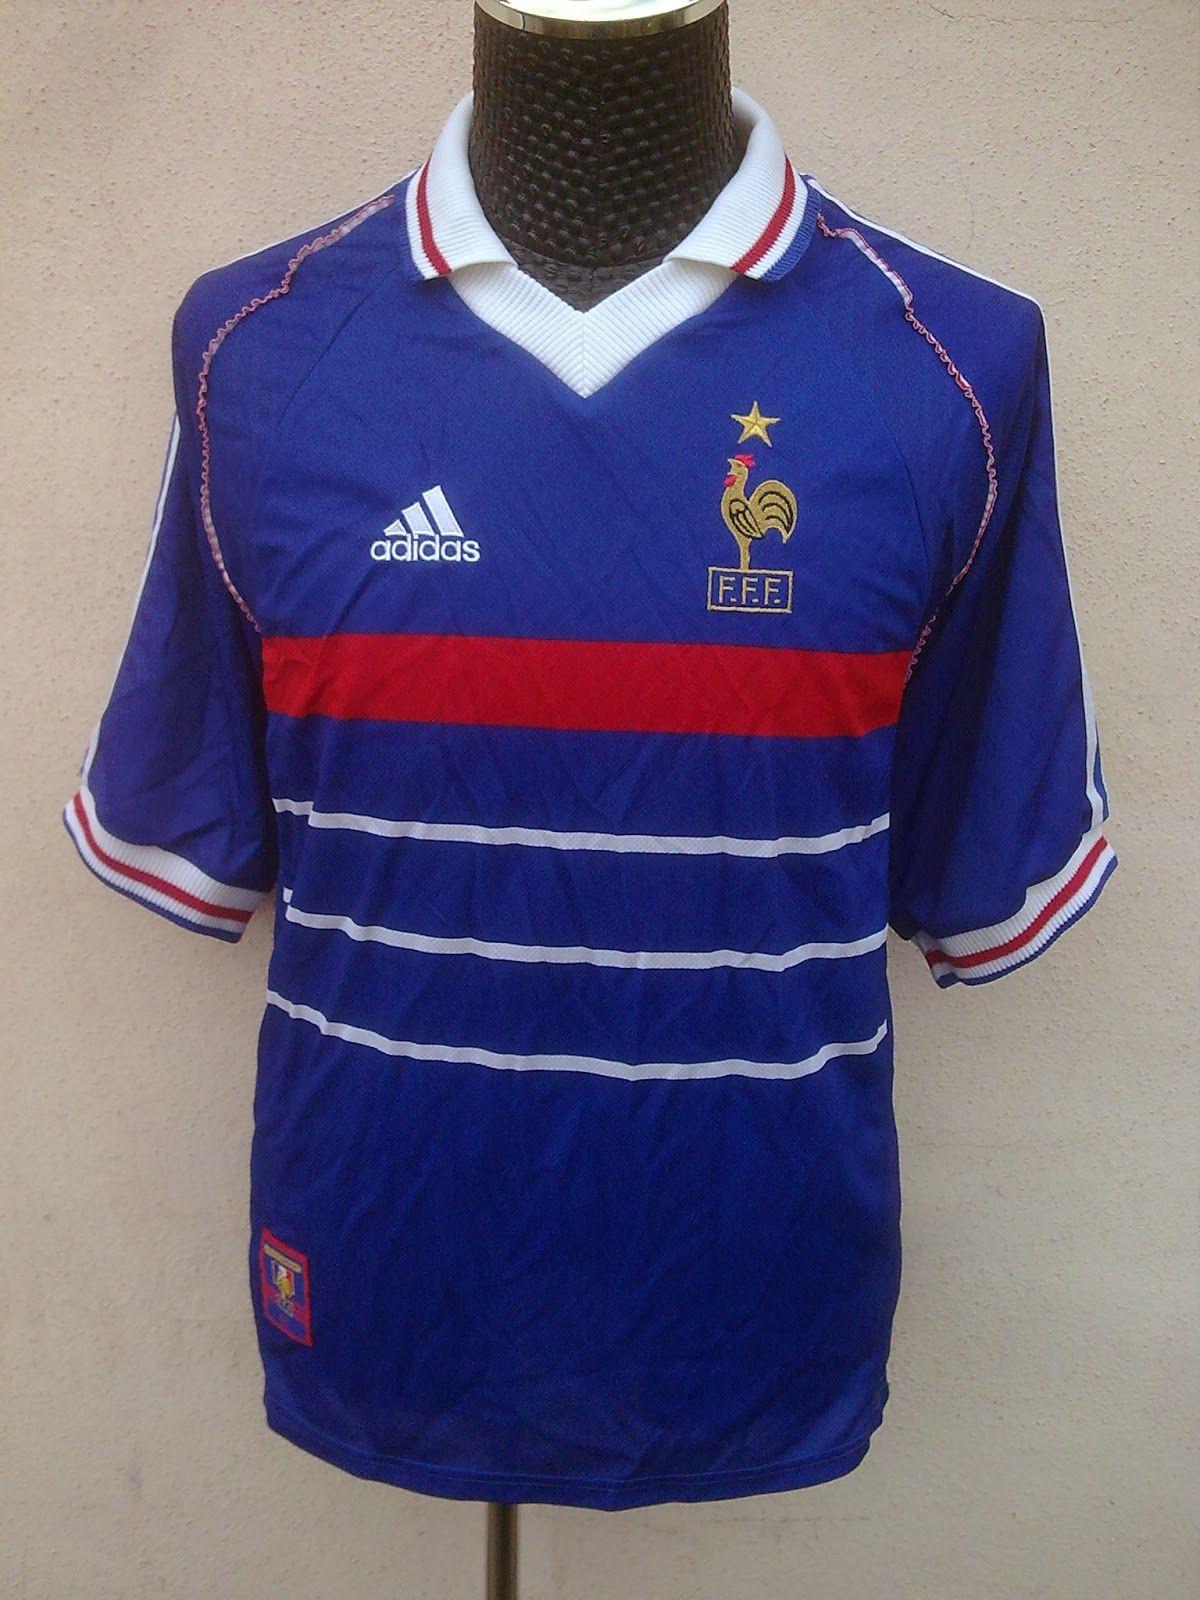 Maillot Equipe de France 19981999 #CDM #Champion #FFF #9ine